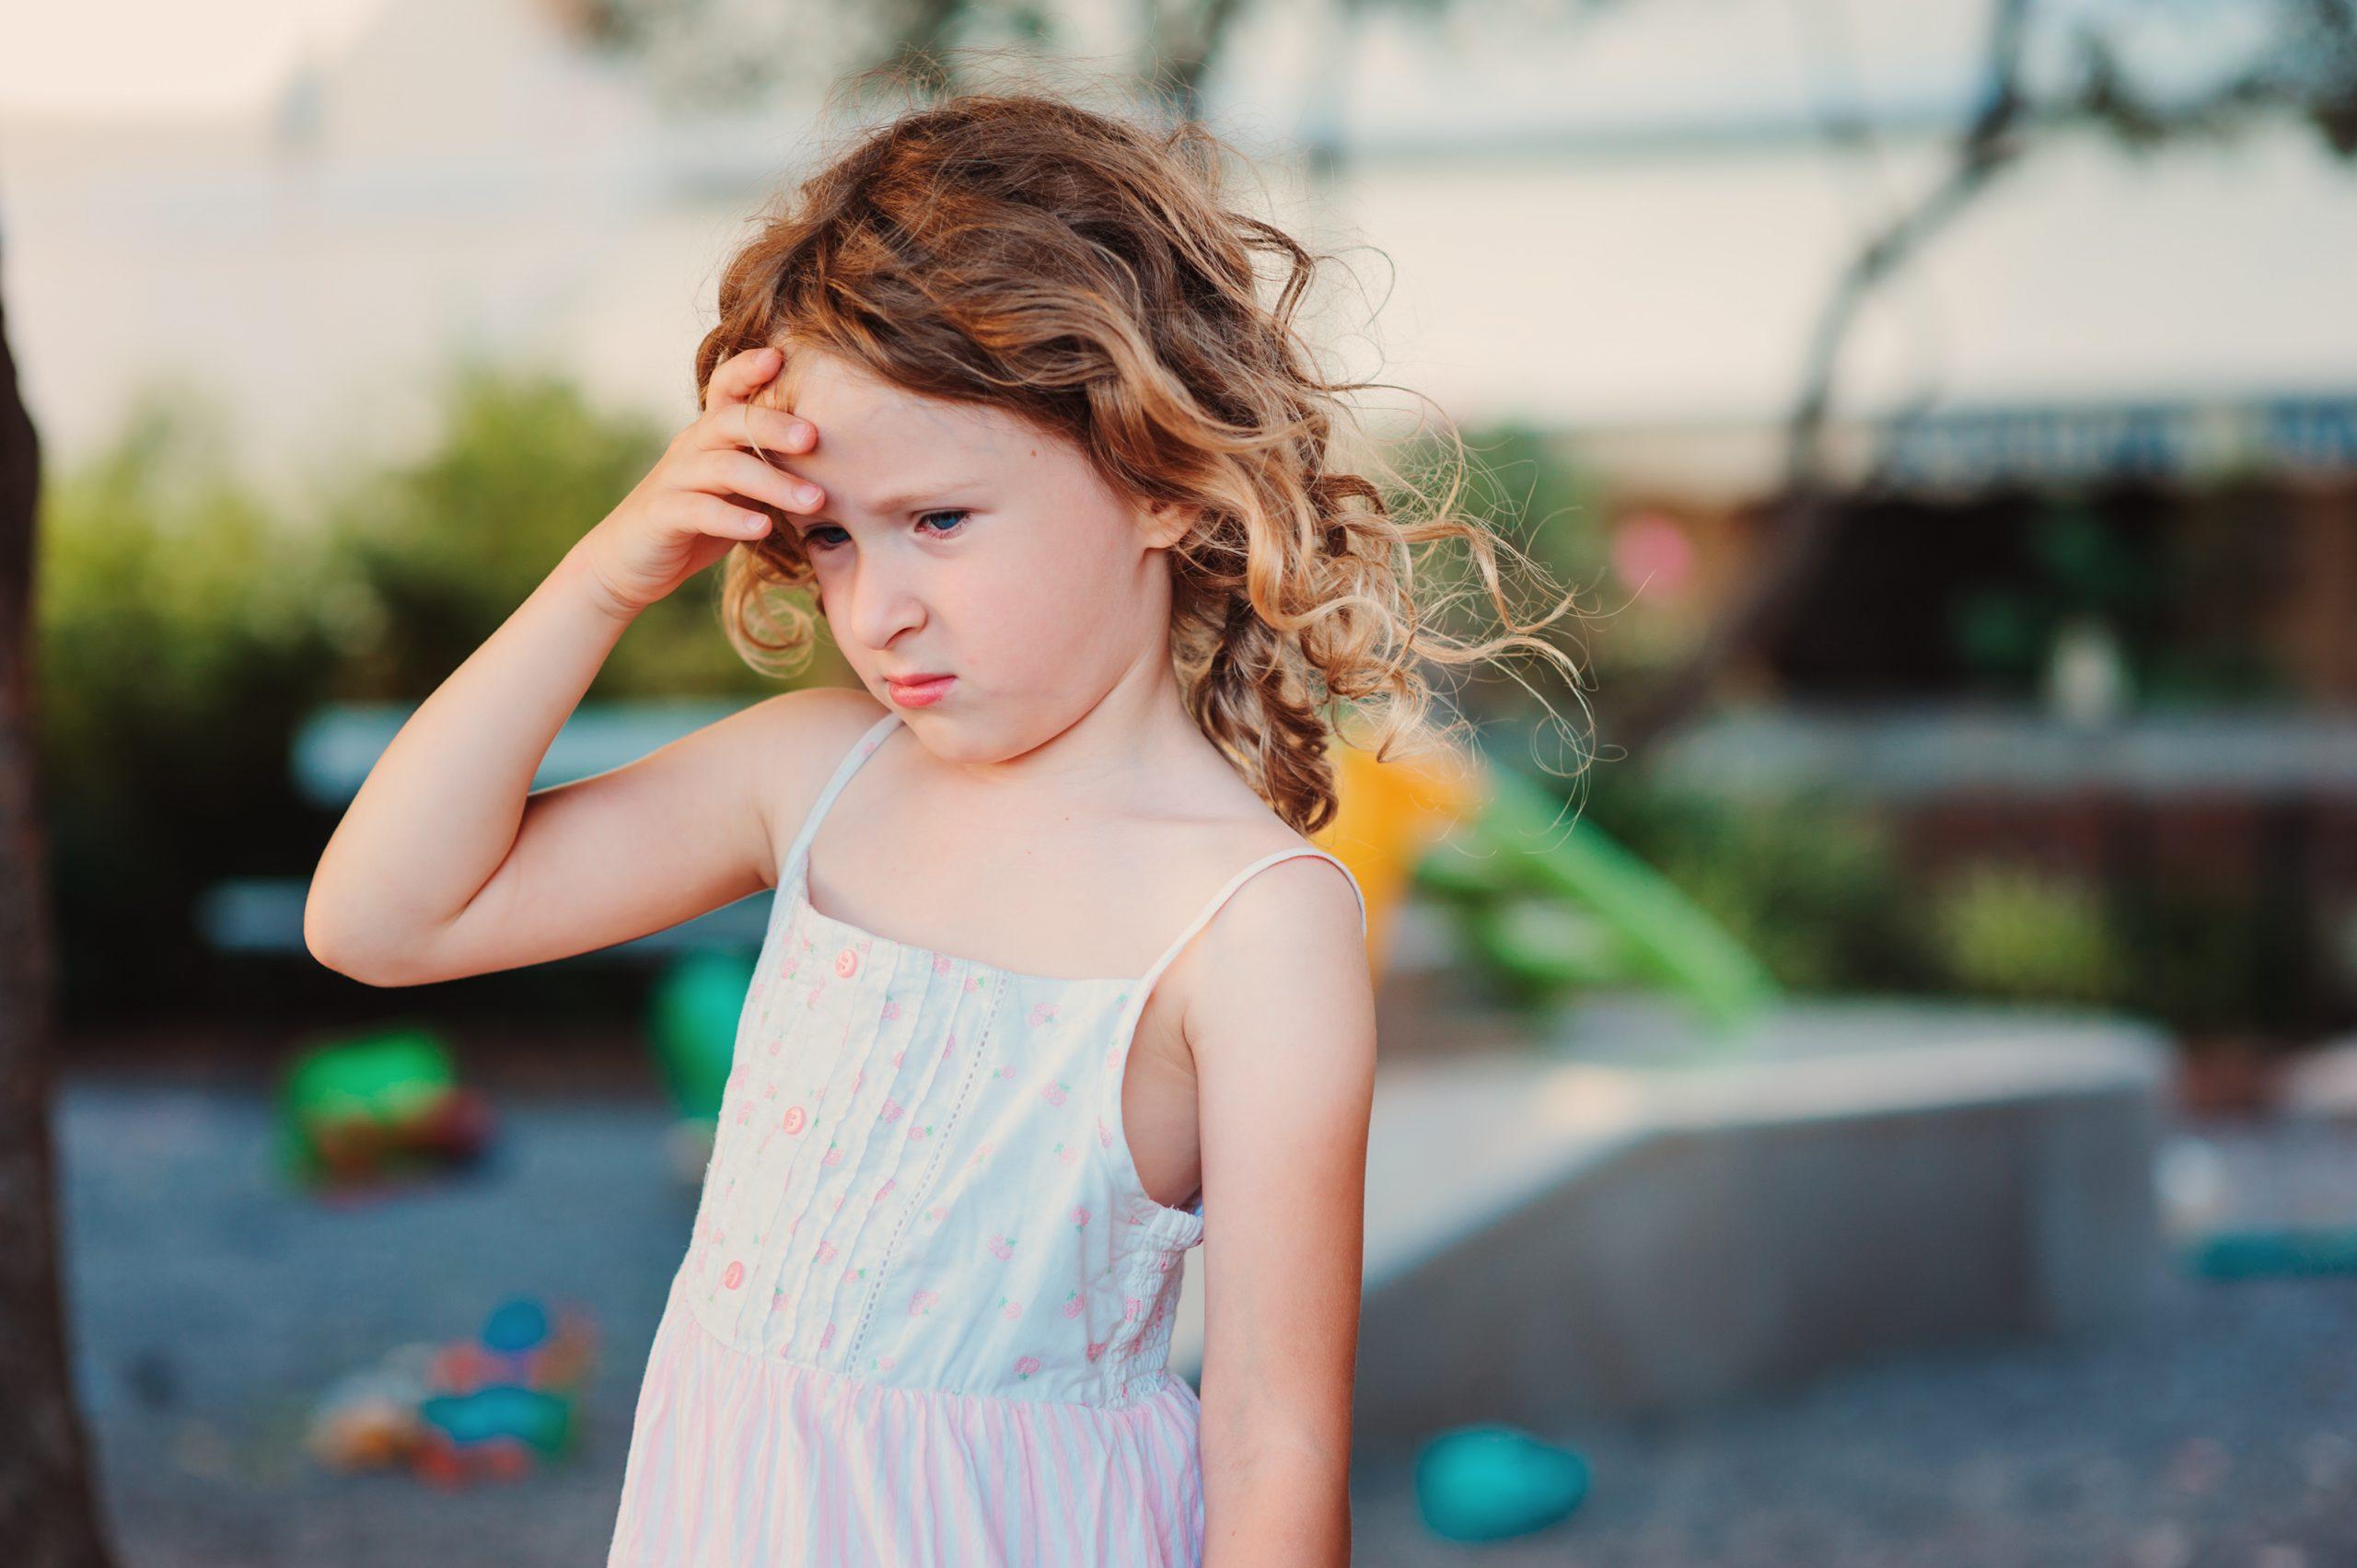 nesvestica kod dece